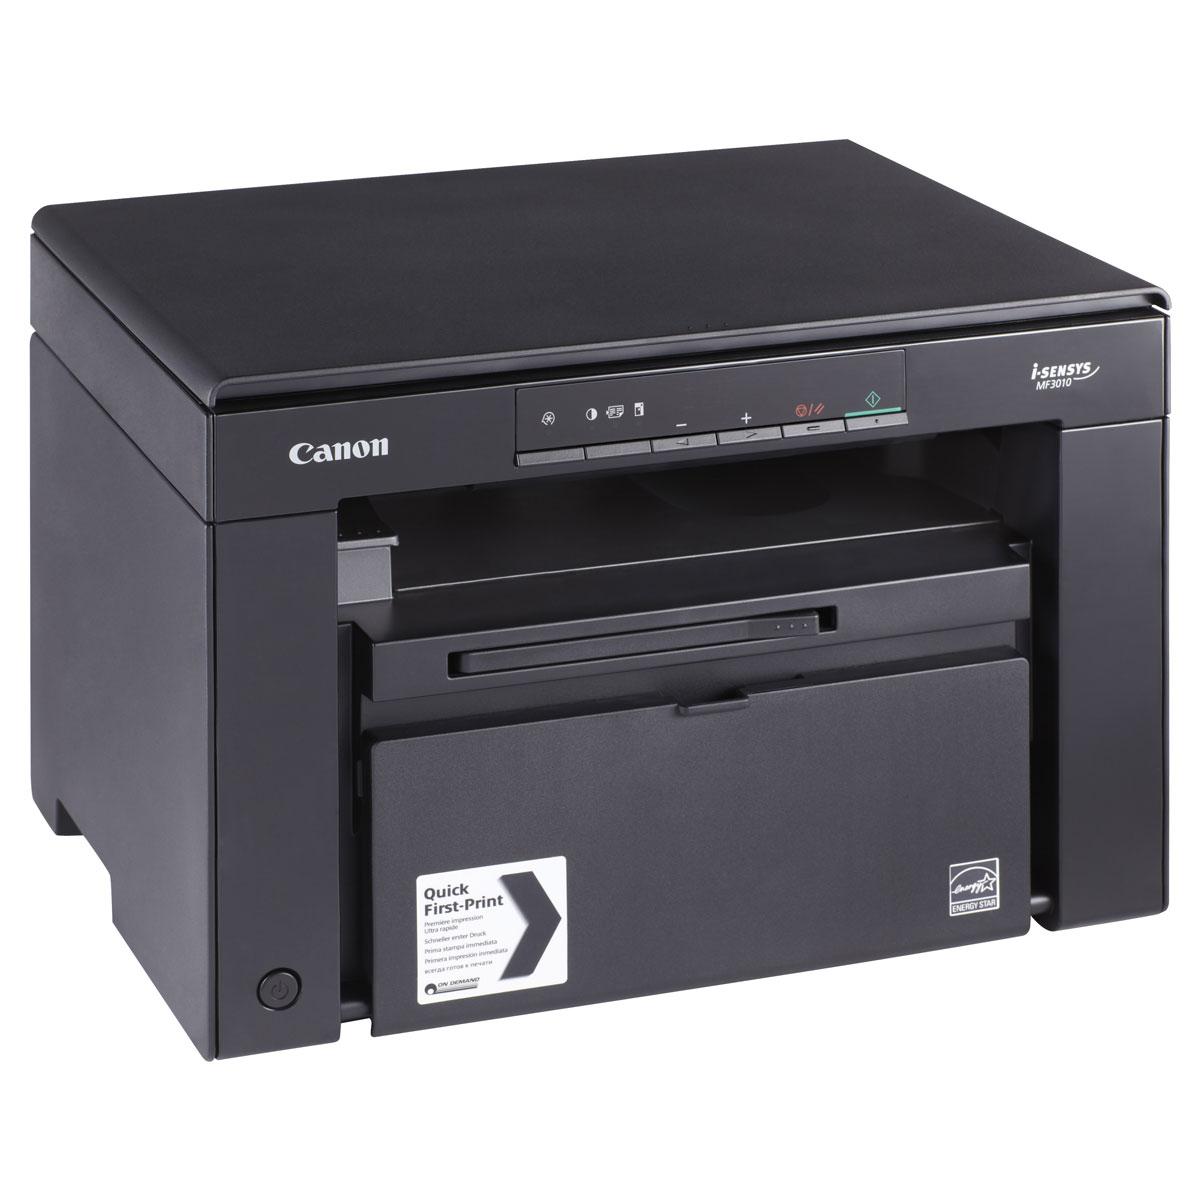 canon i sensys mf 3010 imprimante multifonction canon. Black Bedroom Furniture Sets. Home Design Ideas